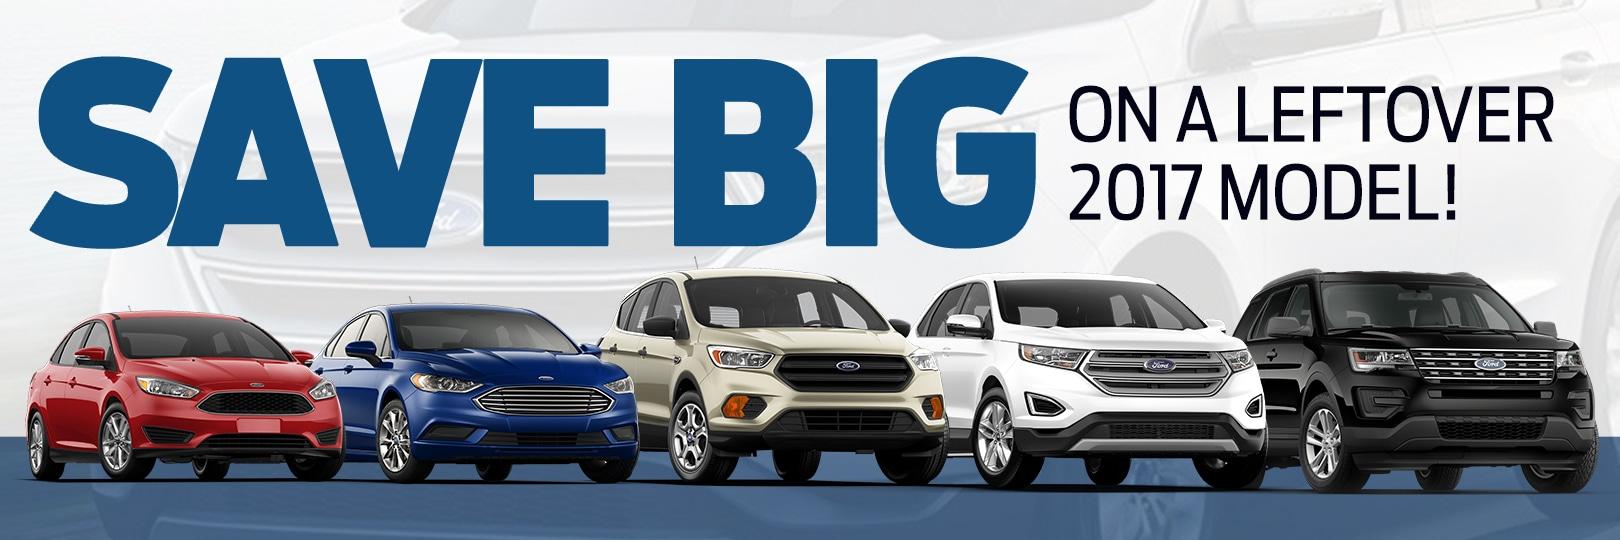 Haldeman Ford Kutztown >> Haldeman Ford Kutztown   Vehicles - Service - Parts - Finance